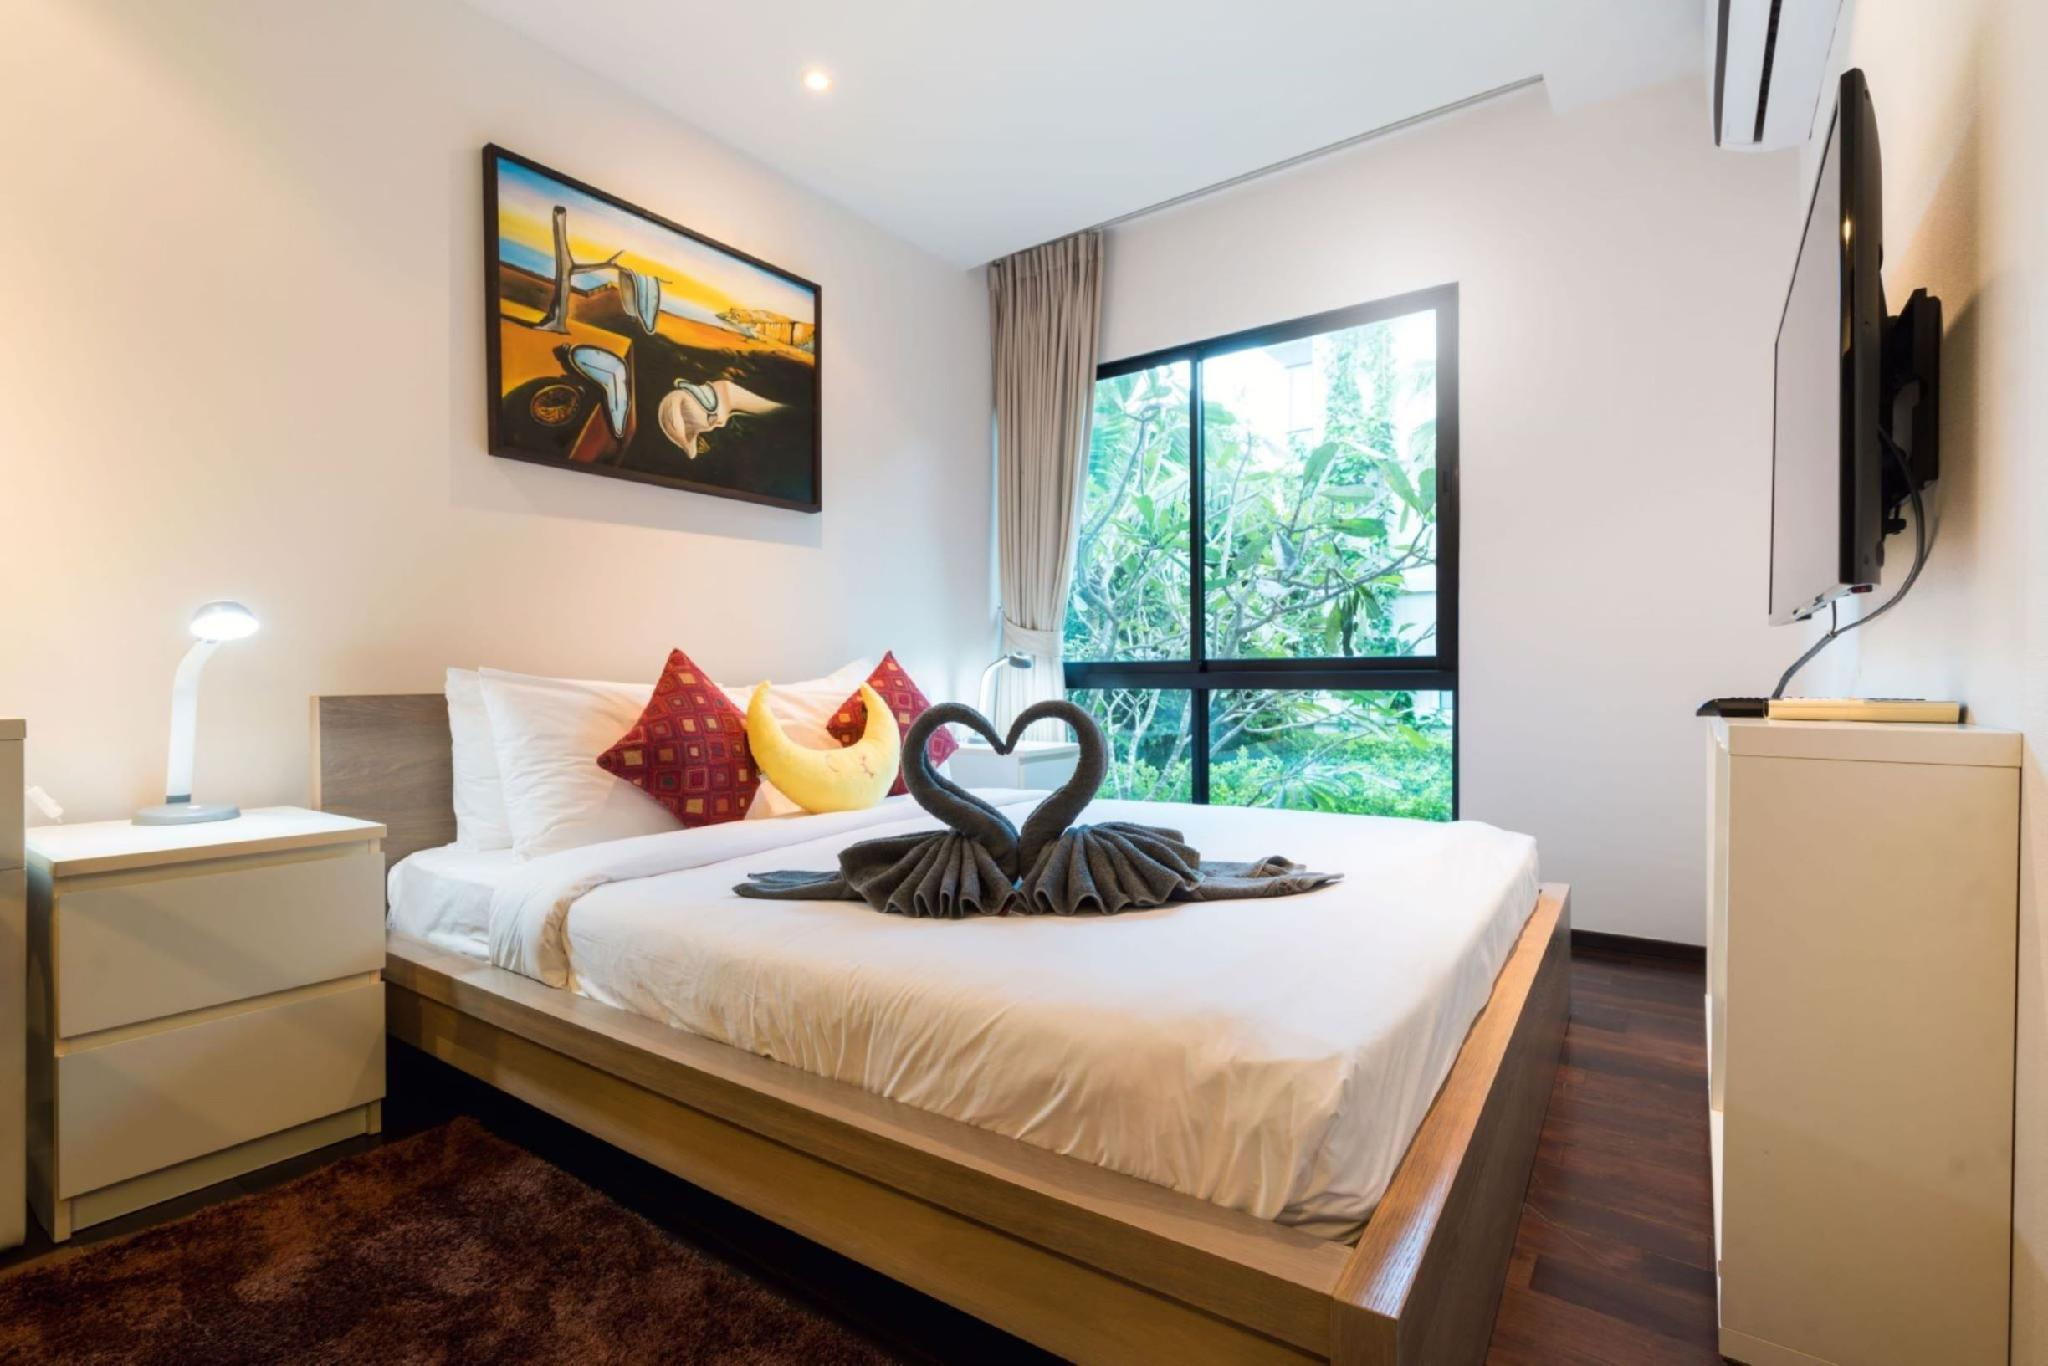 1 BDR Apartment F202 at The Title Beach Rawai อพาร์ตเมนต์ 1 ห้องนอน 1 ห้องน้ำส่วนตัว ขนาด 43 ตร.ม. – หาดราไวย์